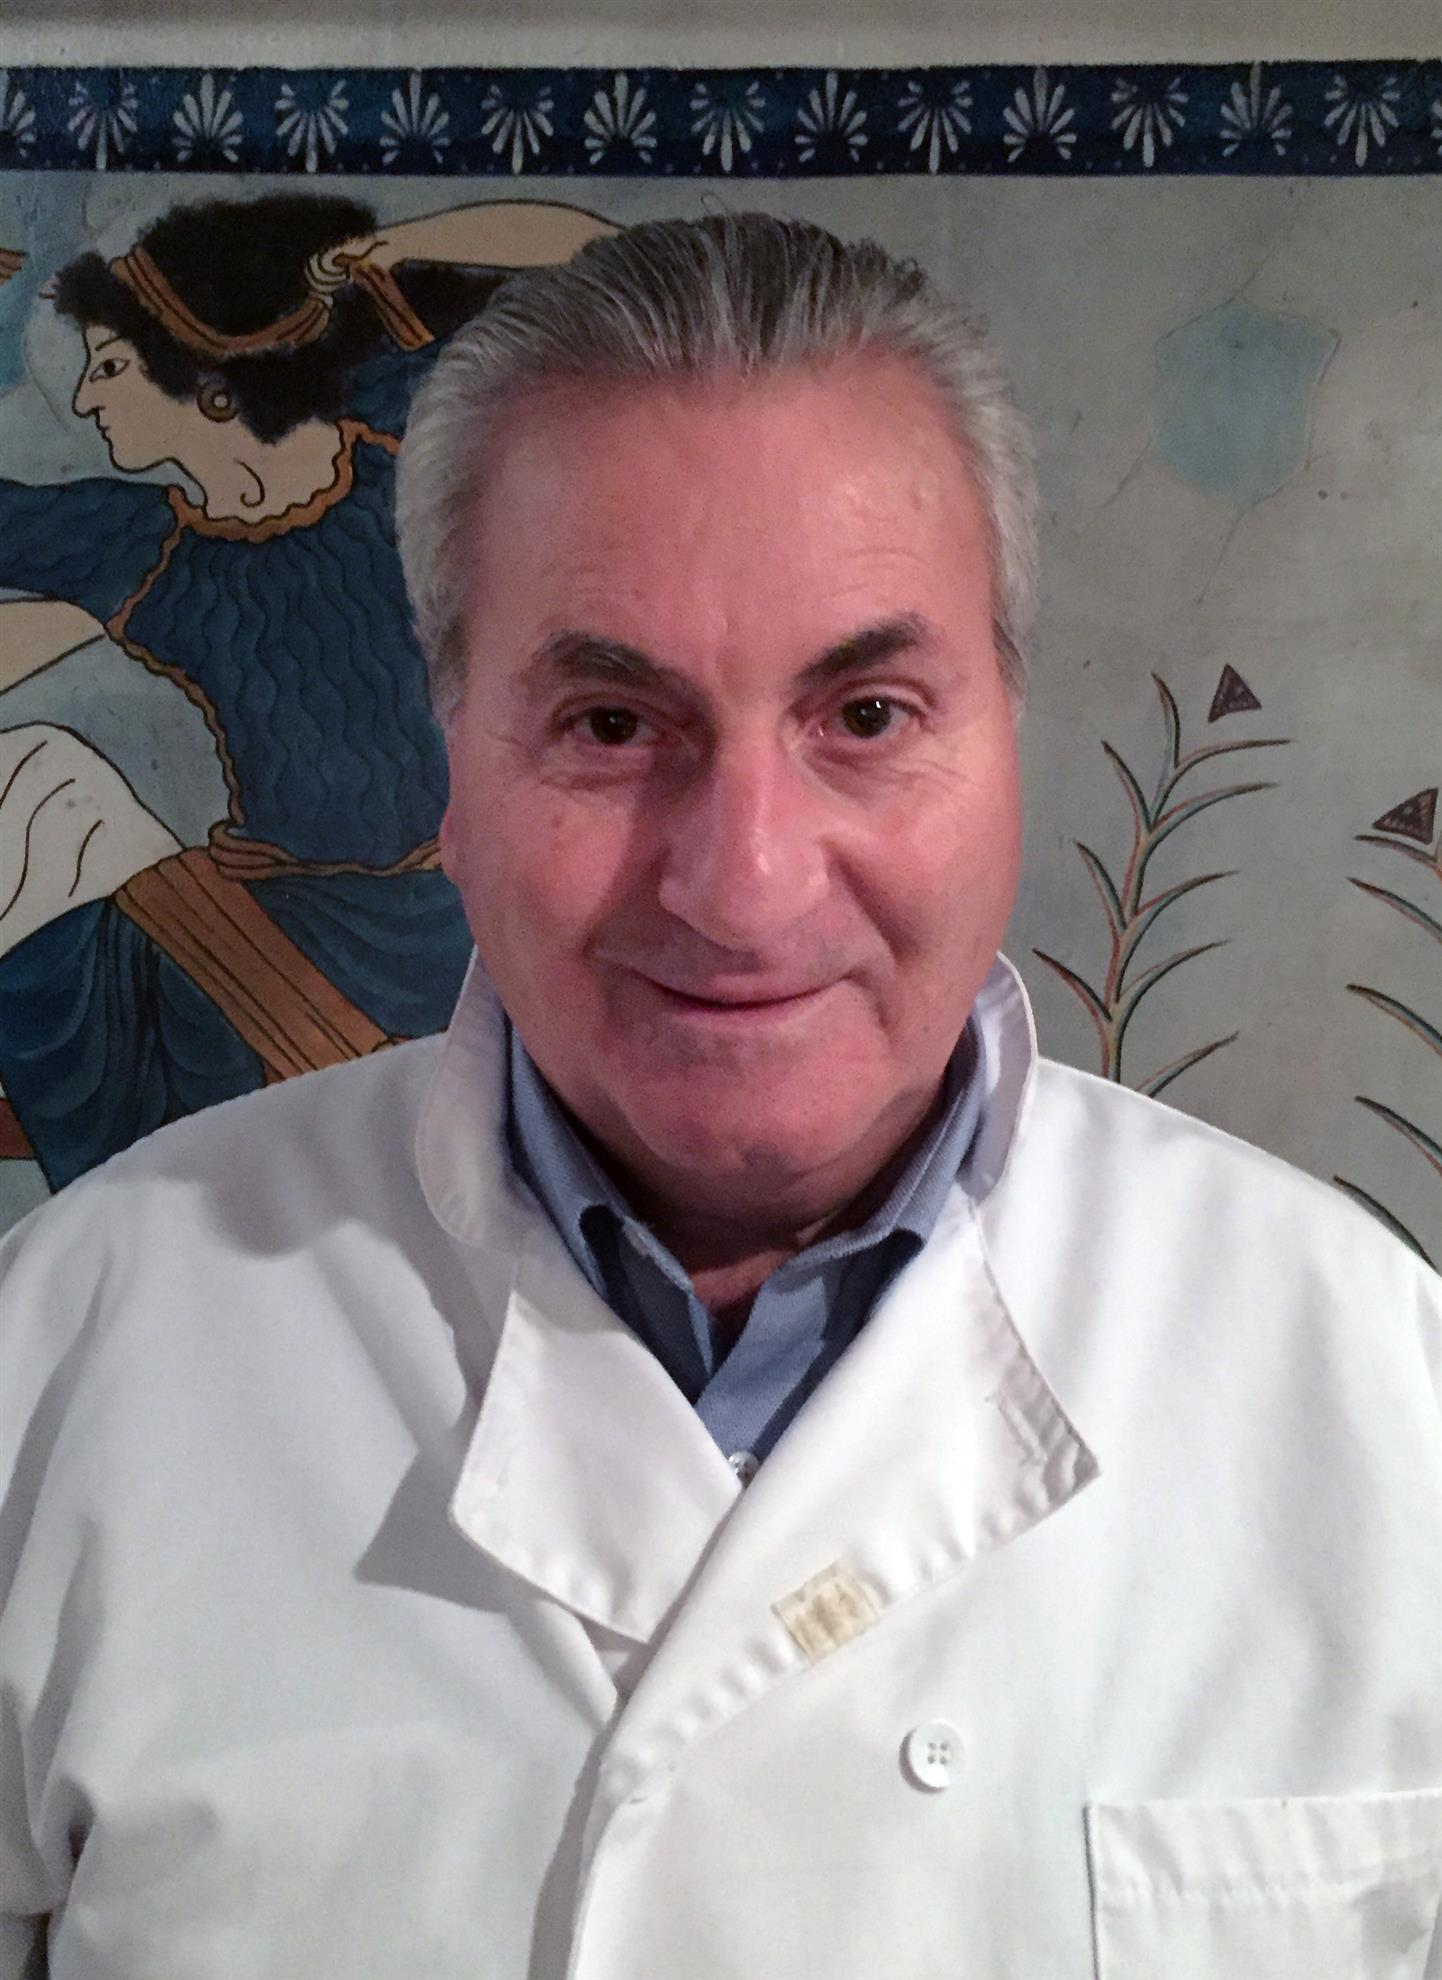 Demetre Theodosakis